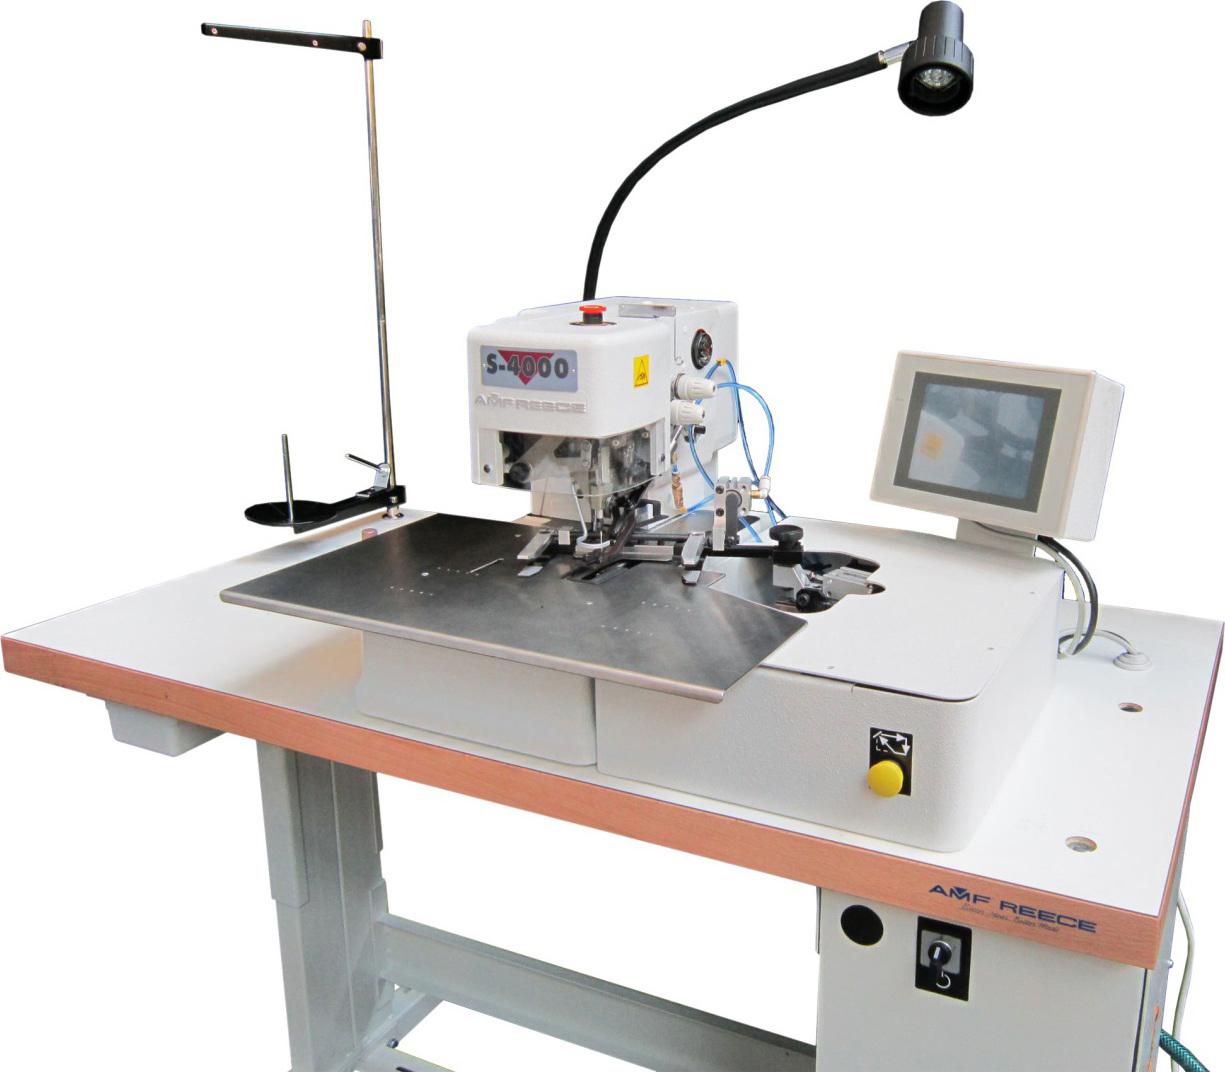 AMFReece_S4000_Machine.jpeg